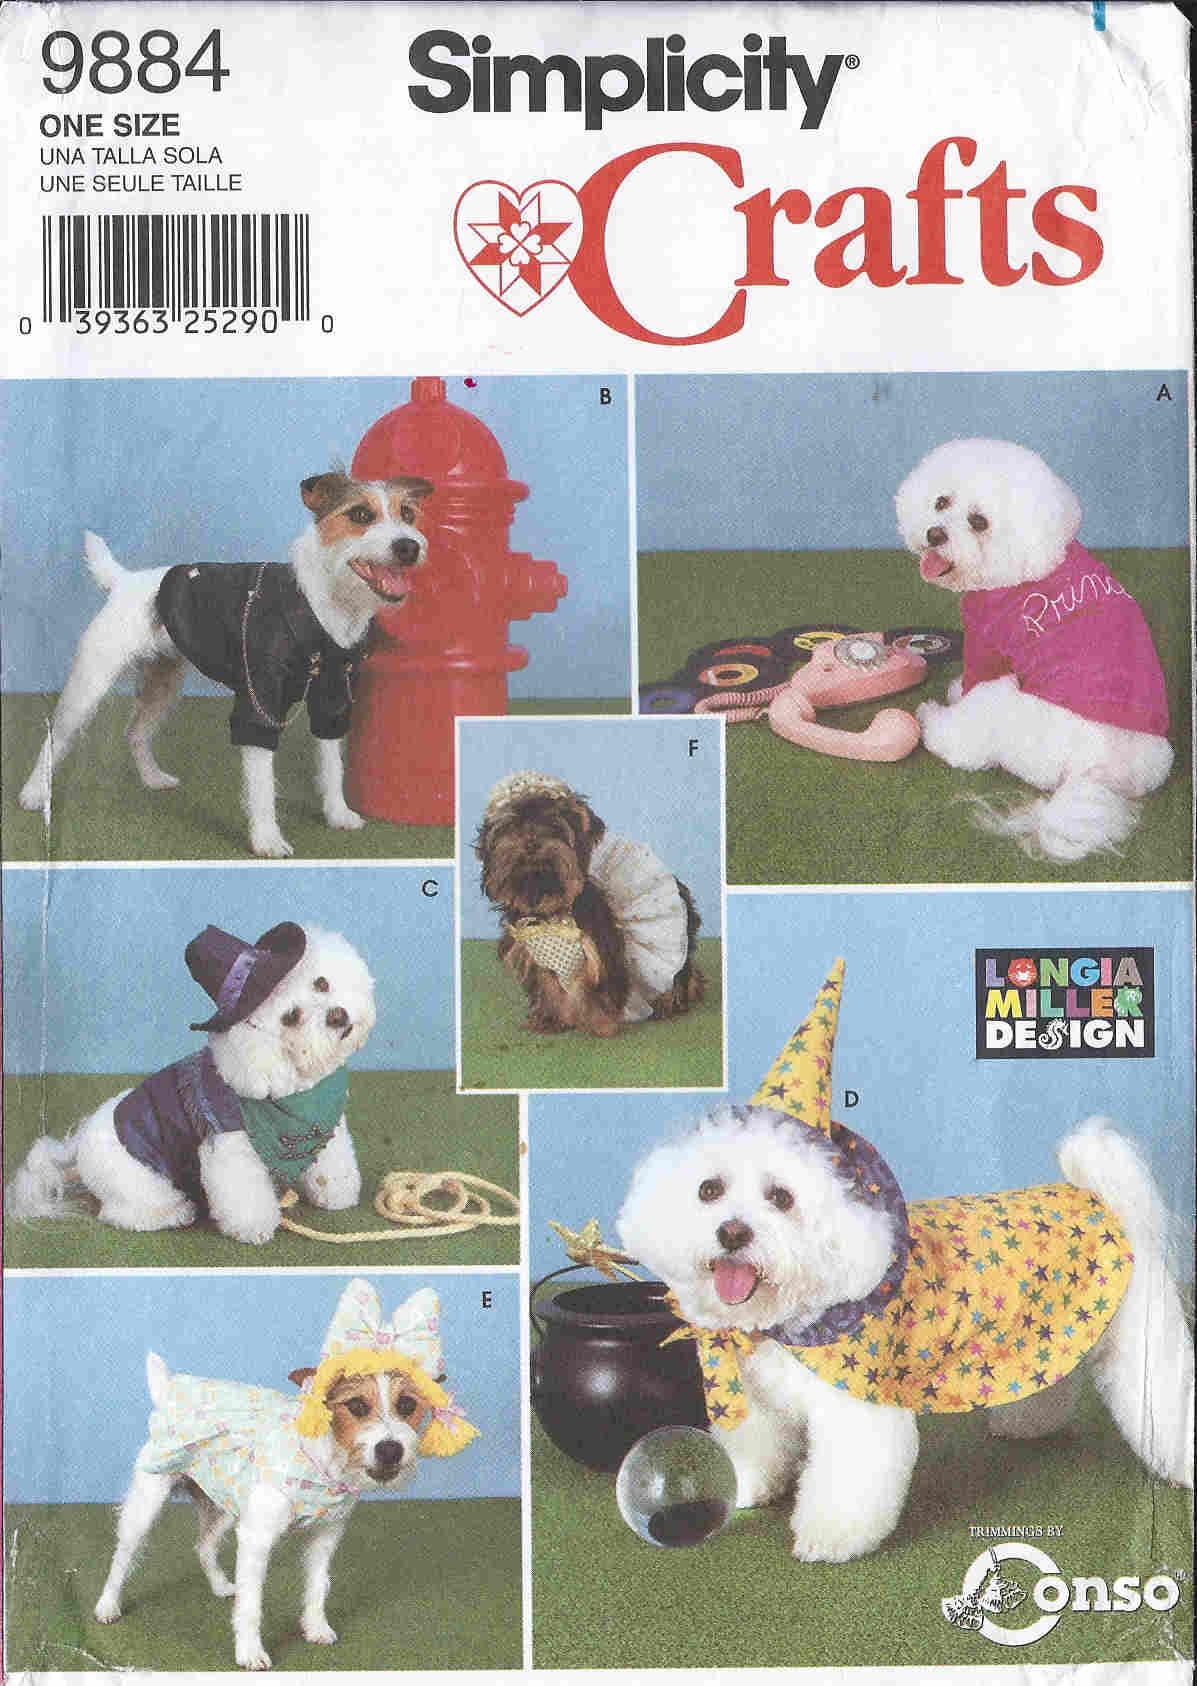 longia miller dog costume sewing pattern